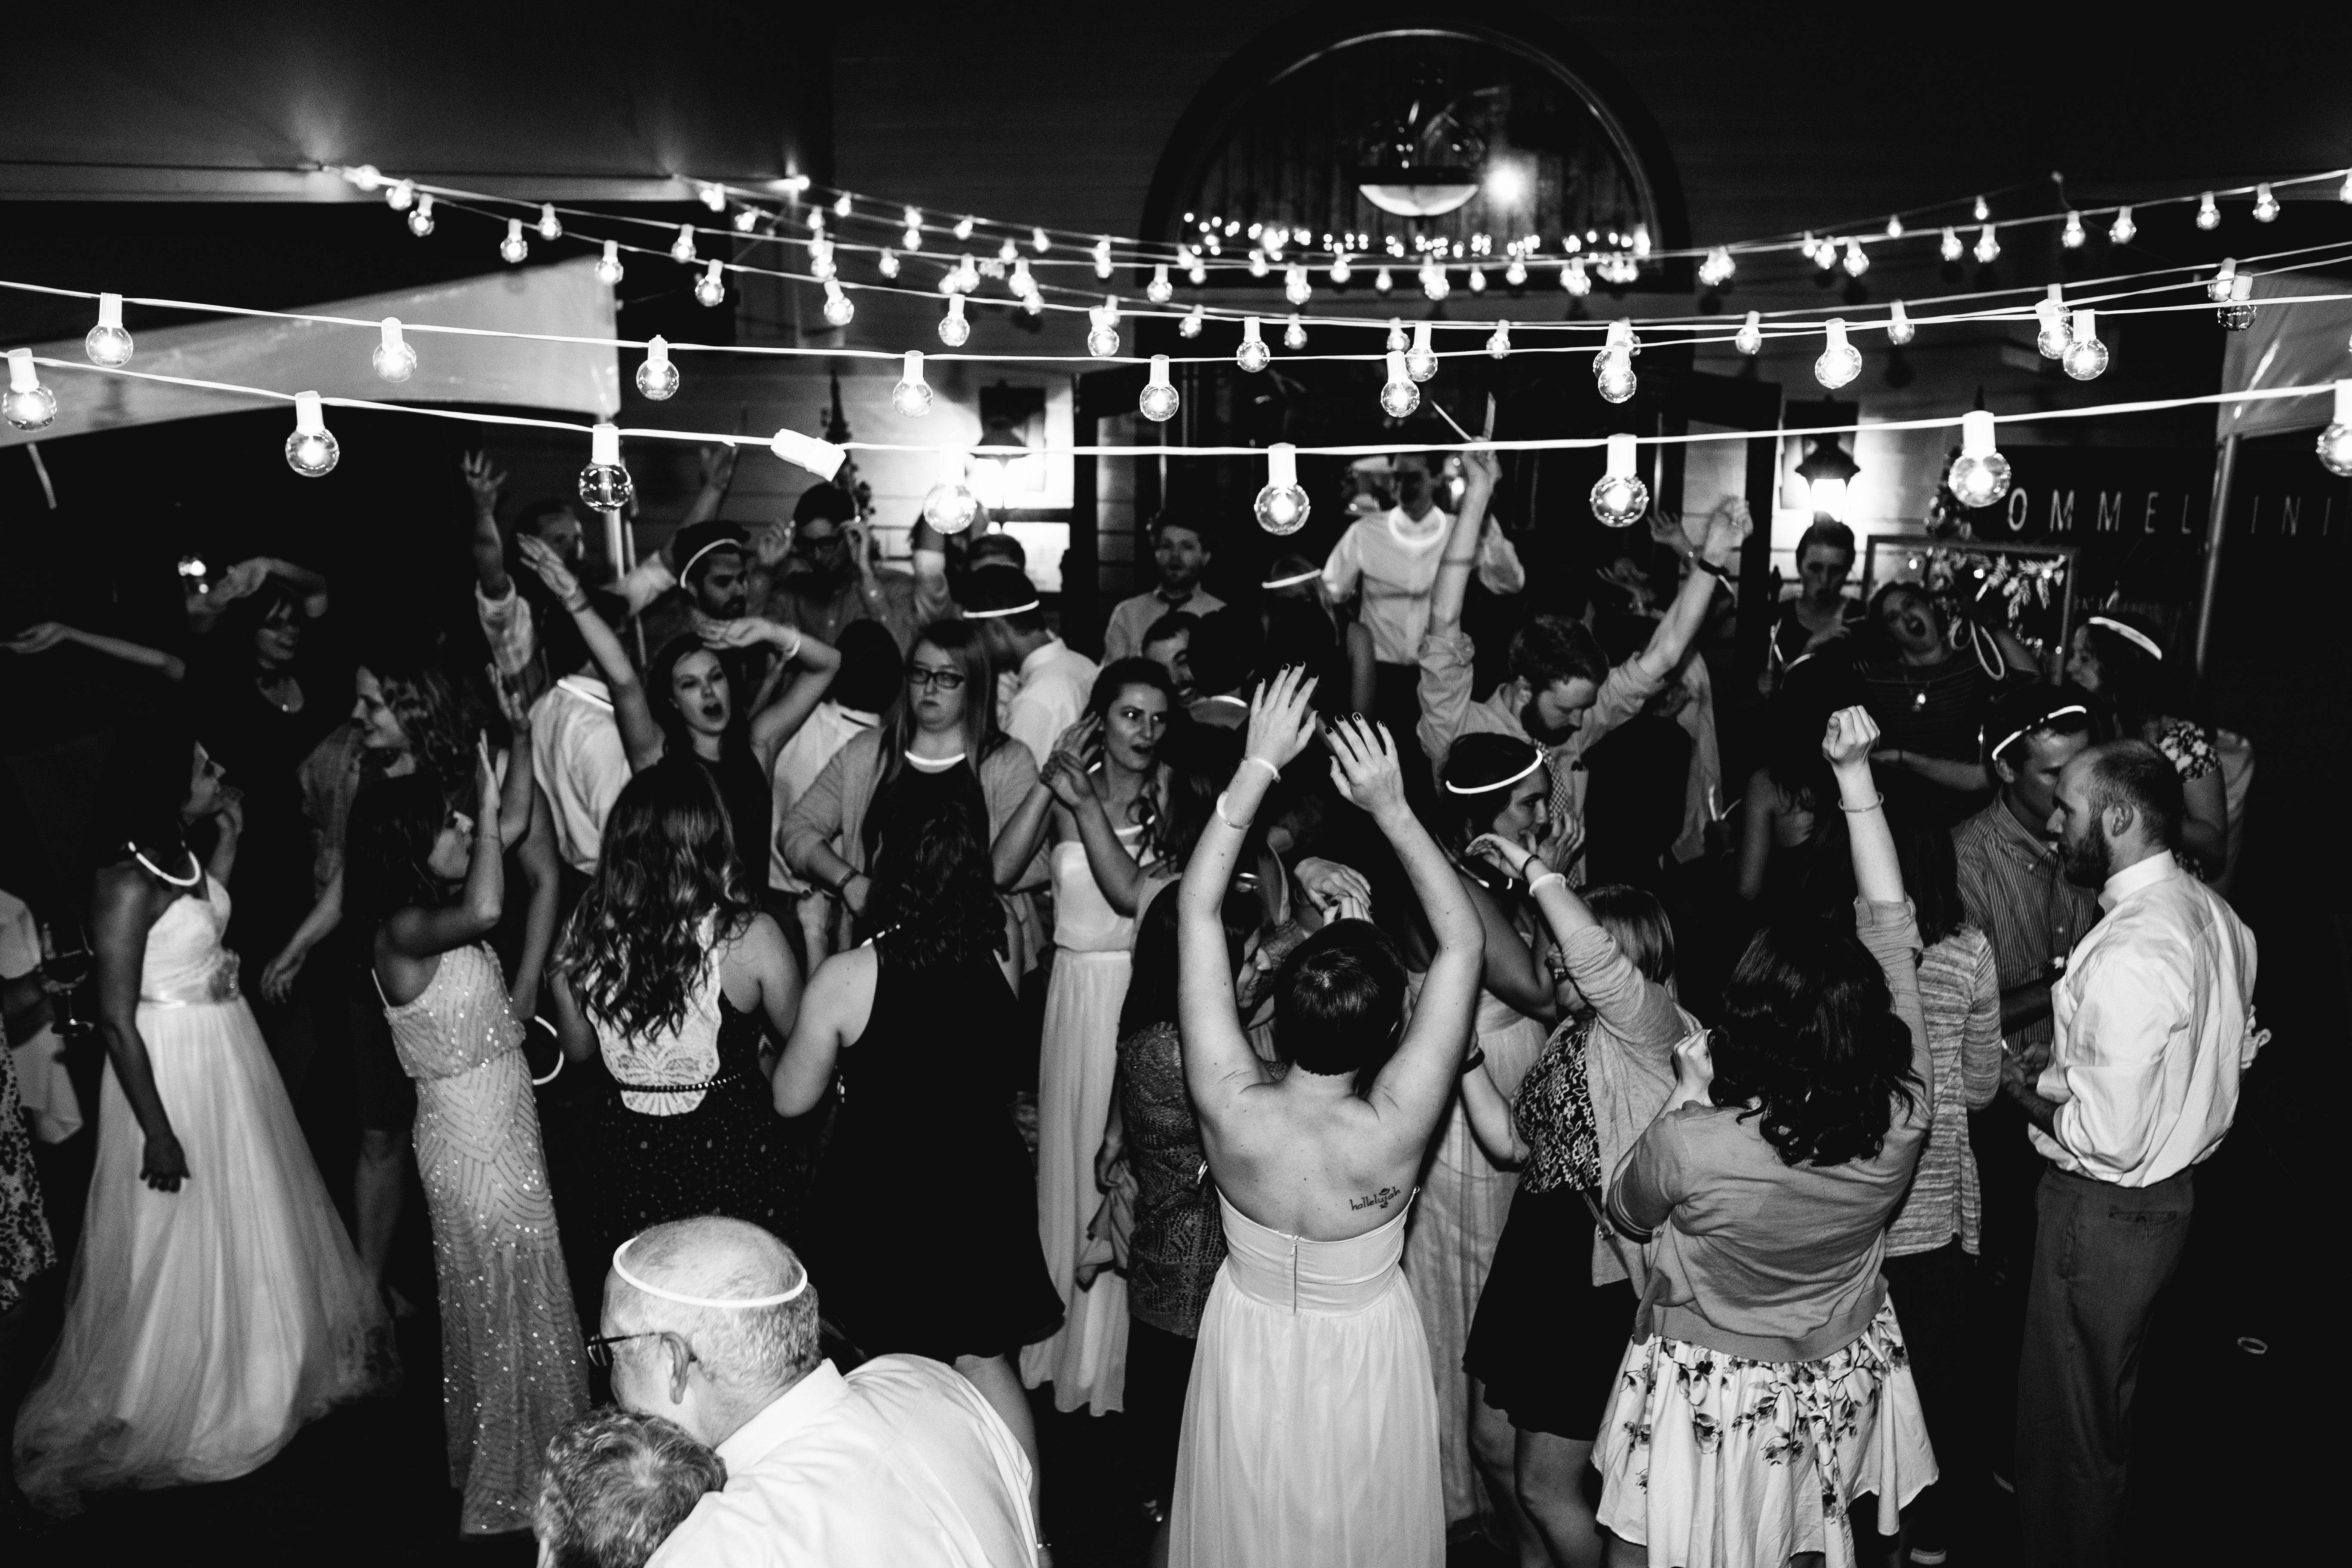 2017 Grand Exit, Commellini's Grand Exit of 2017, 2017 Celebration, New Year, Celebration, 2017, Commellini Estate, Spokane wedding venues, Spokane event venue, Spokane wa, wedding venues, Spokane event venue, pnw wedding, pnw, family owned, estate, Commellini Estate,